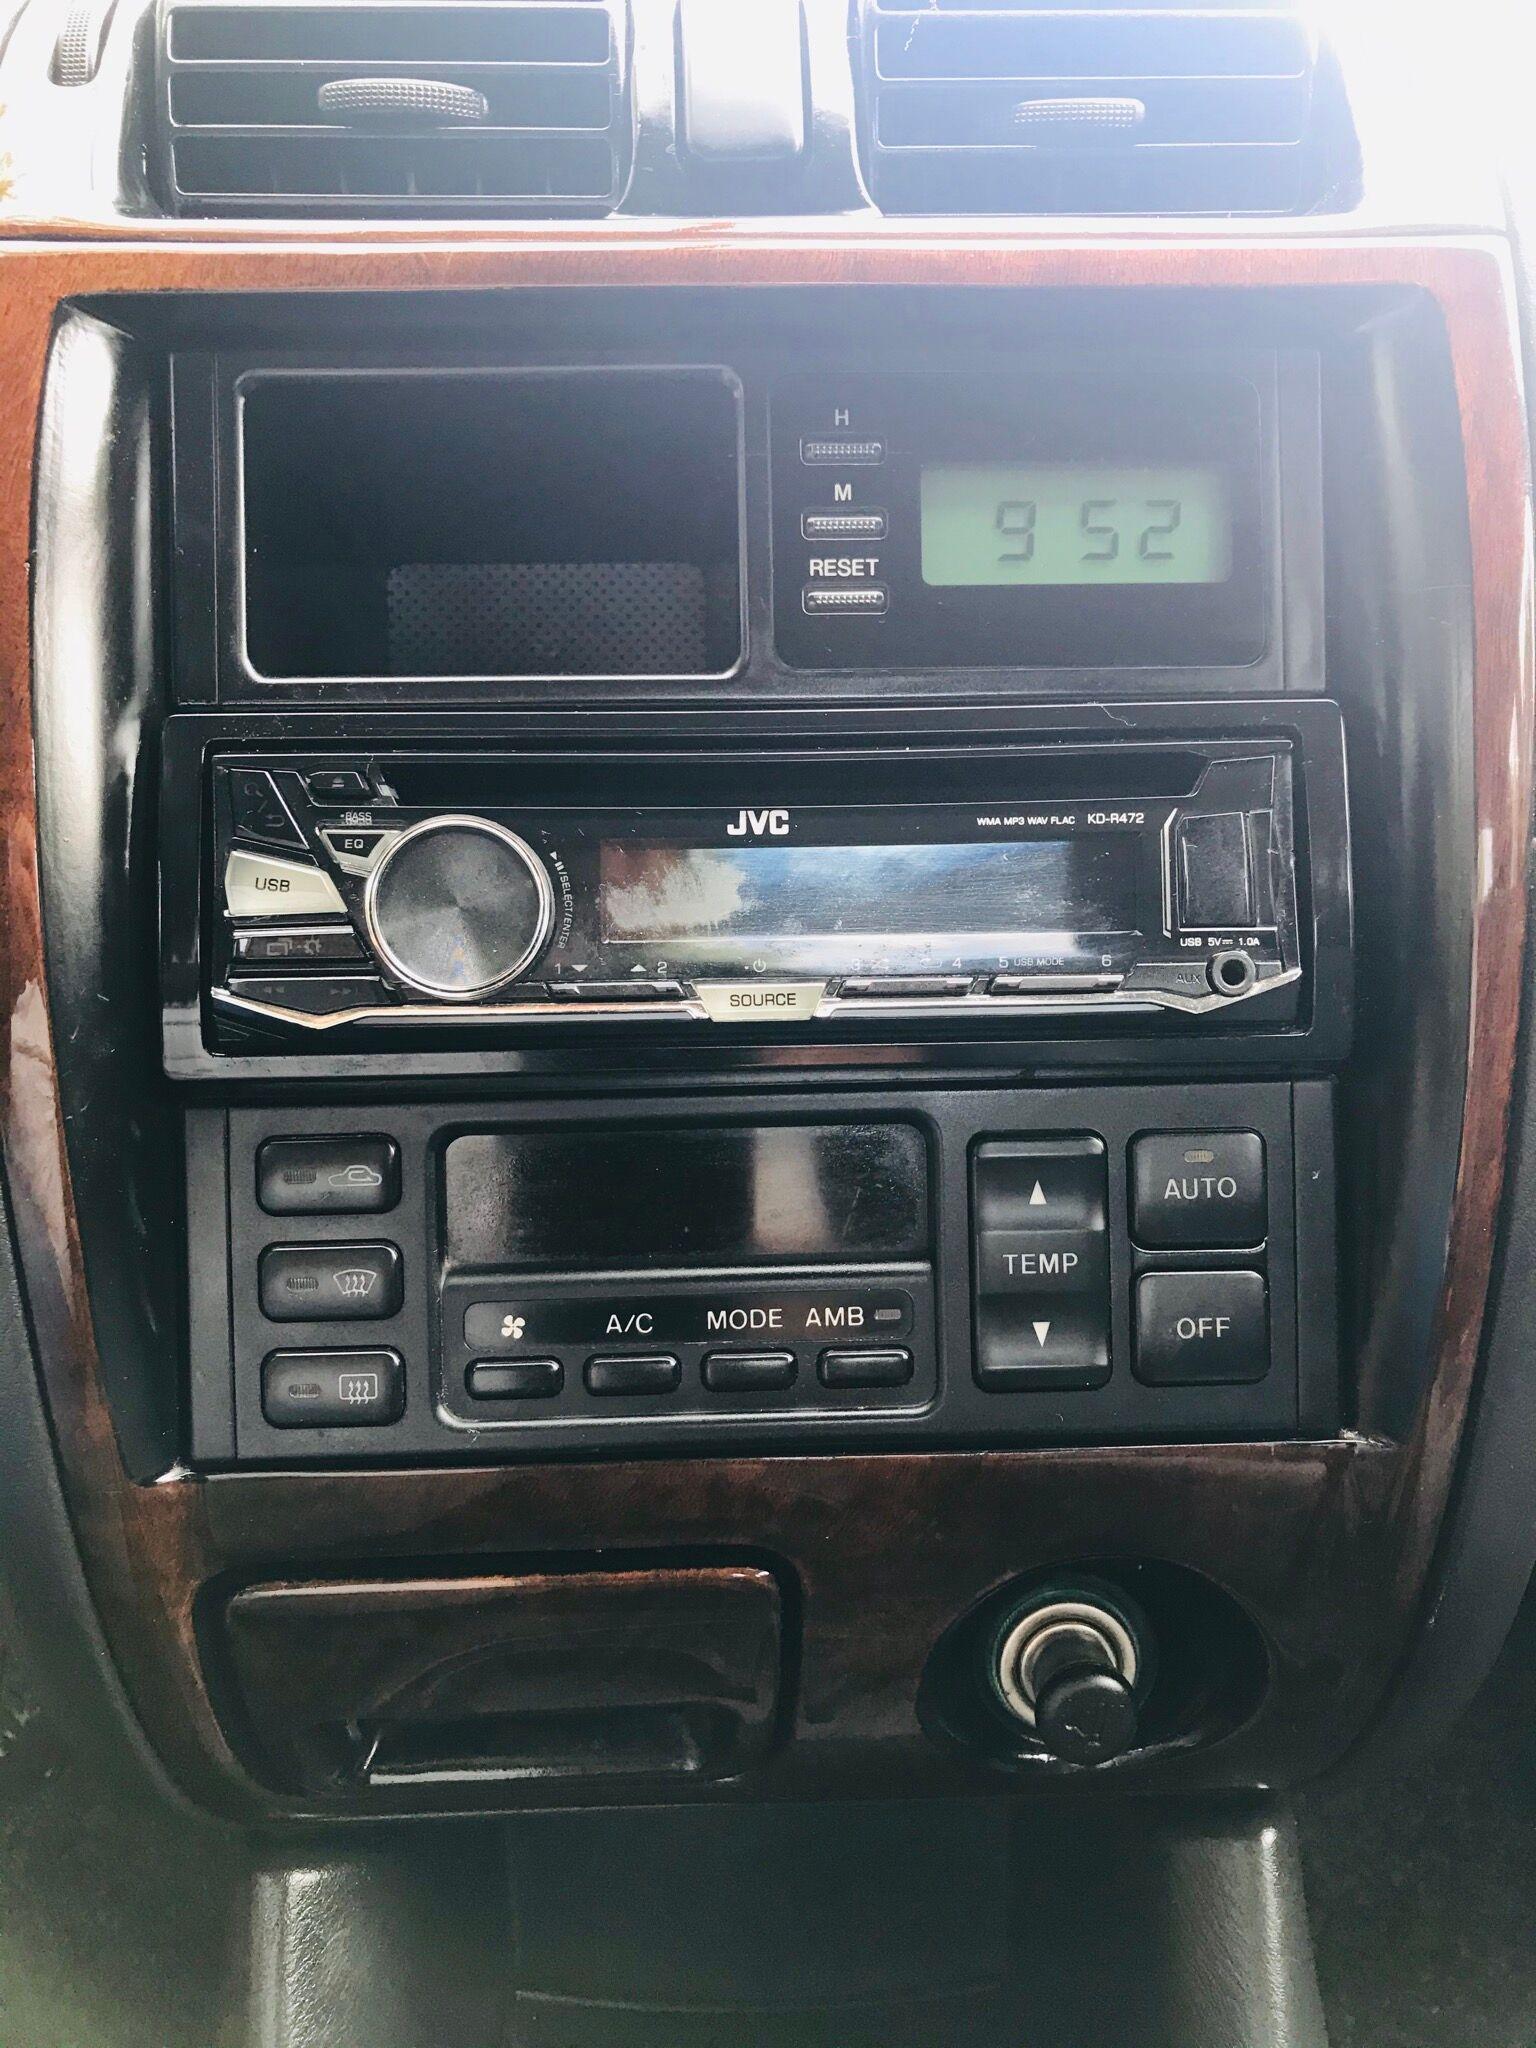 Mazda 626 Mazda 626 1,8essence airco 4 vitre électrique